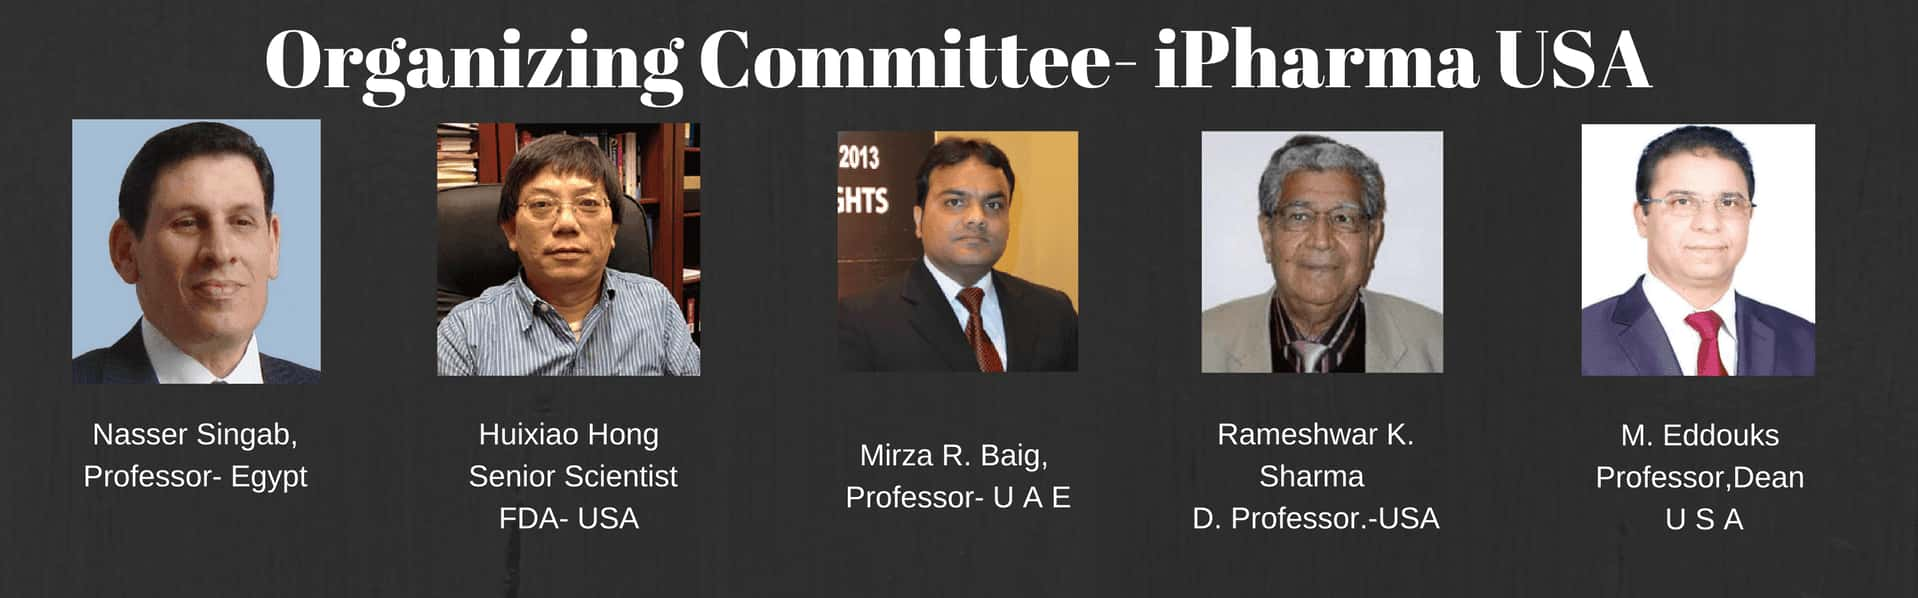 Organizing Committee-iPharma2018